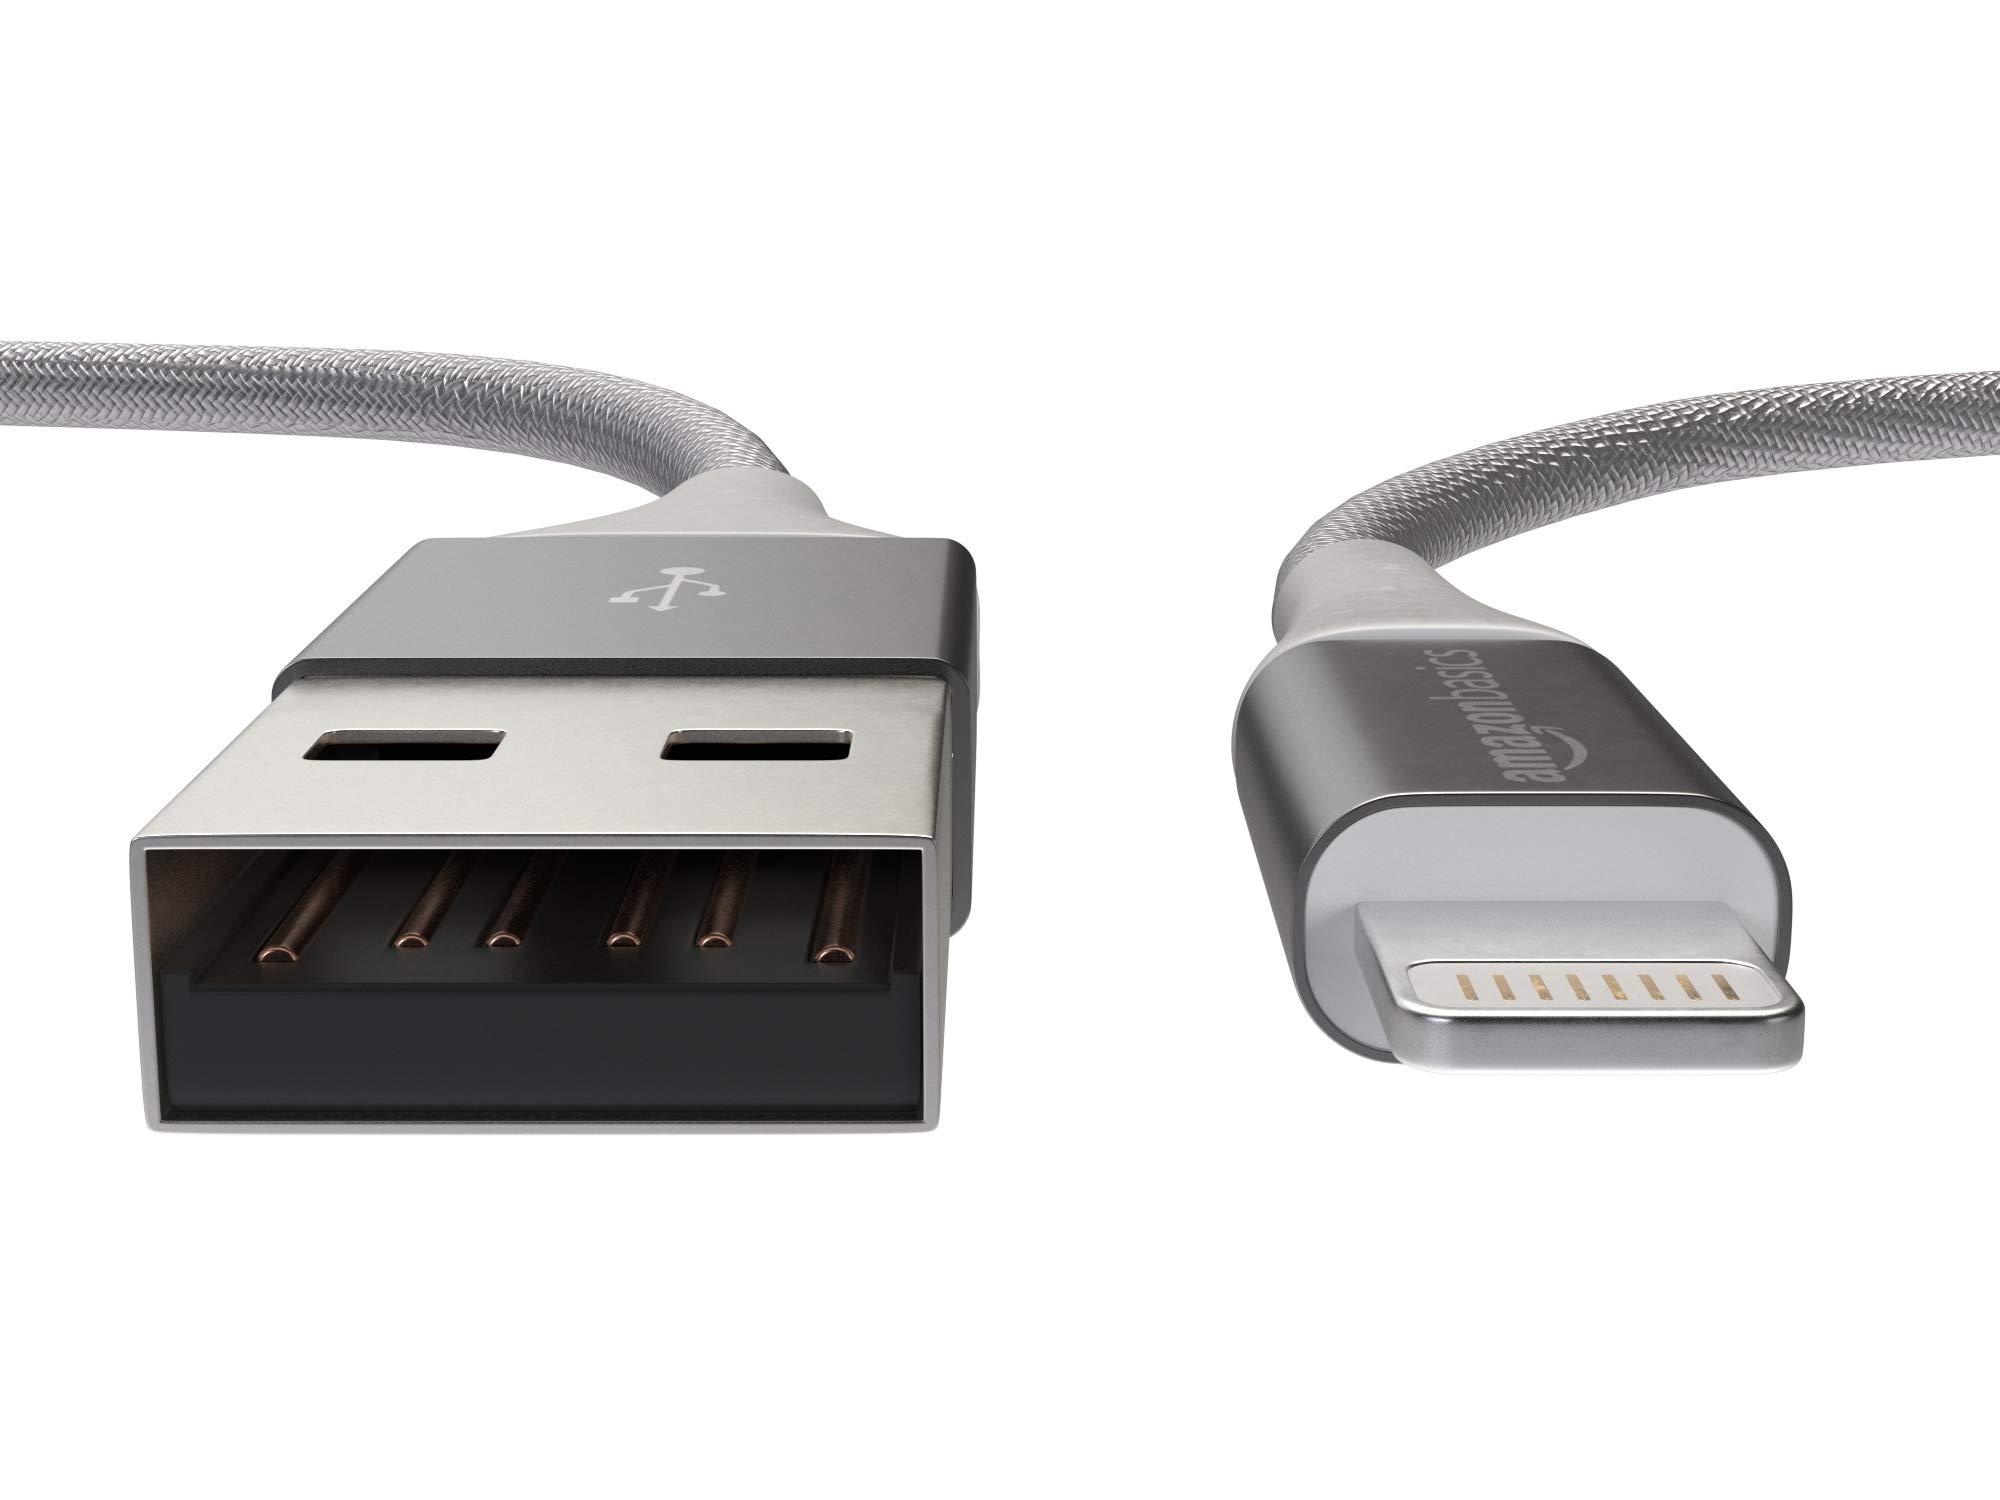 AmazonBasics-USB-A-auf-Lightning-Kabel-mit-doppelt-geflochtenem-Nylon-Apple-MFi-zertifiziert-Silberfarben-3-Meters